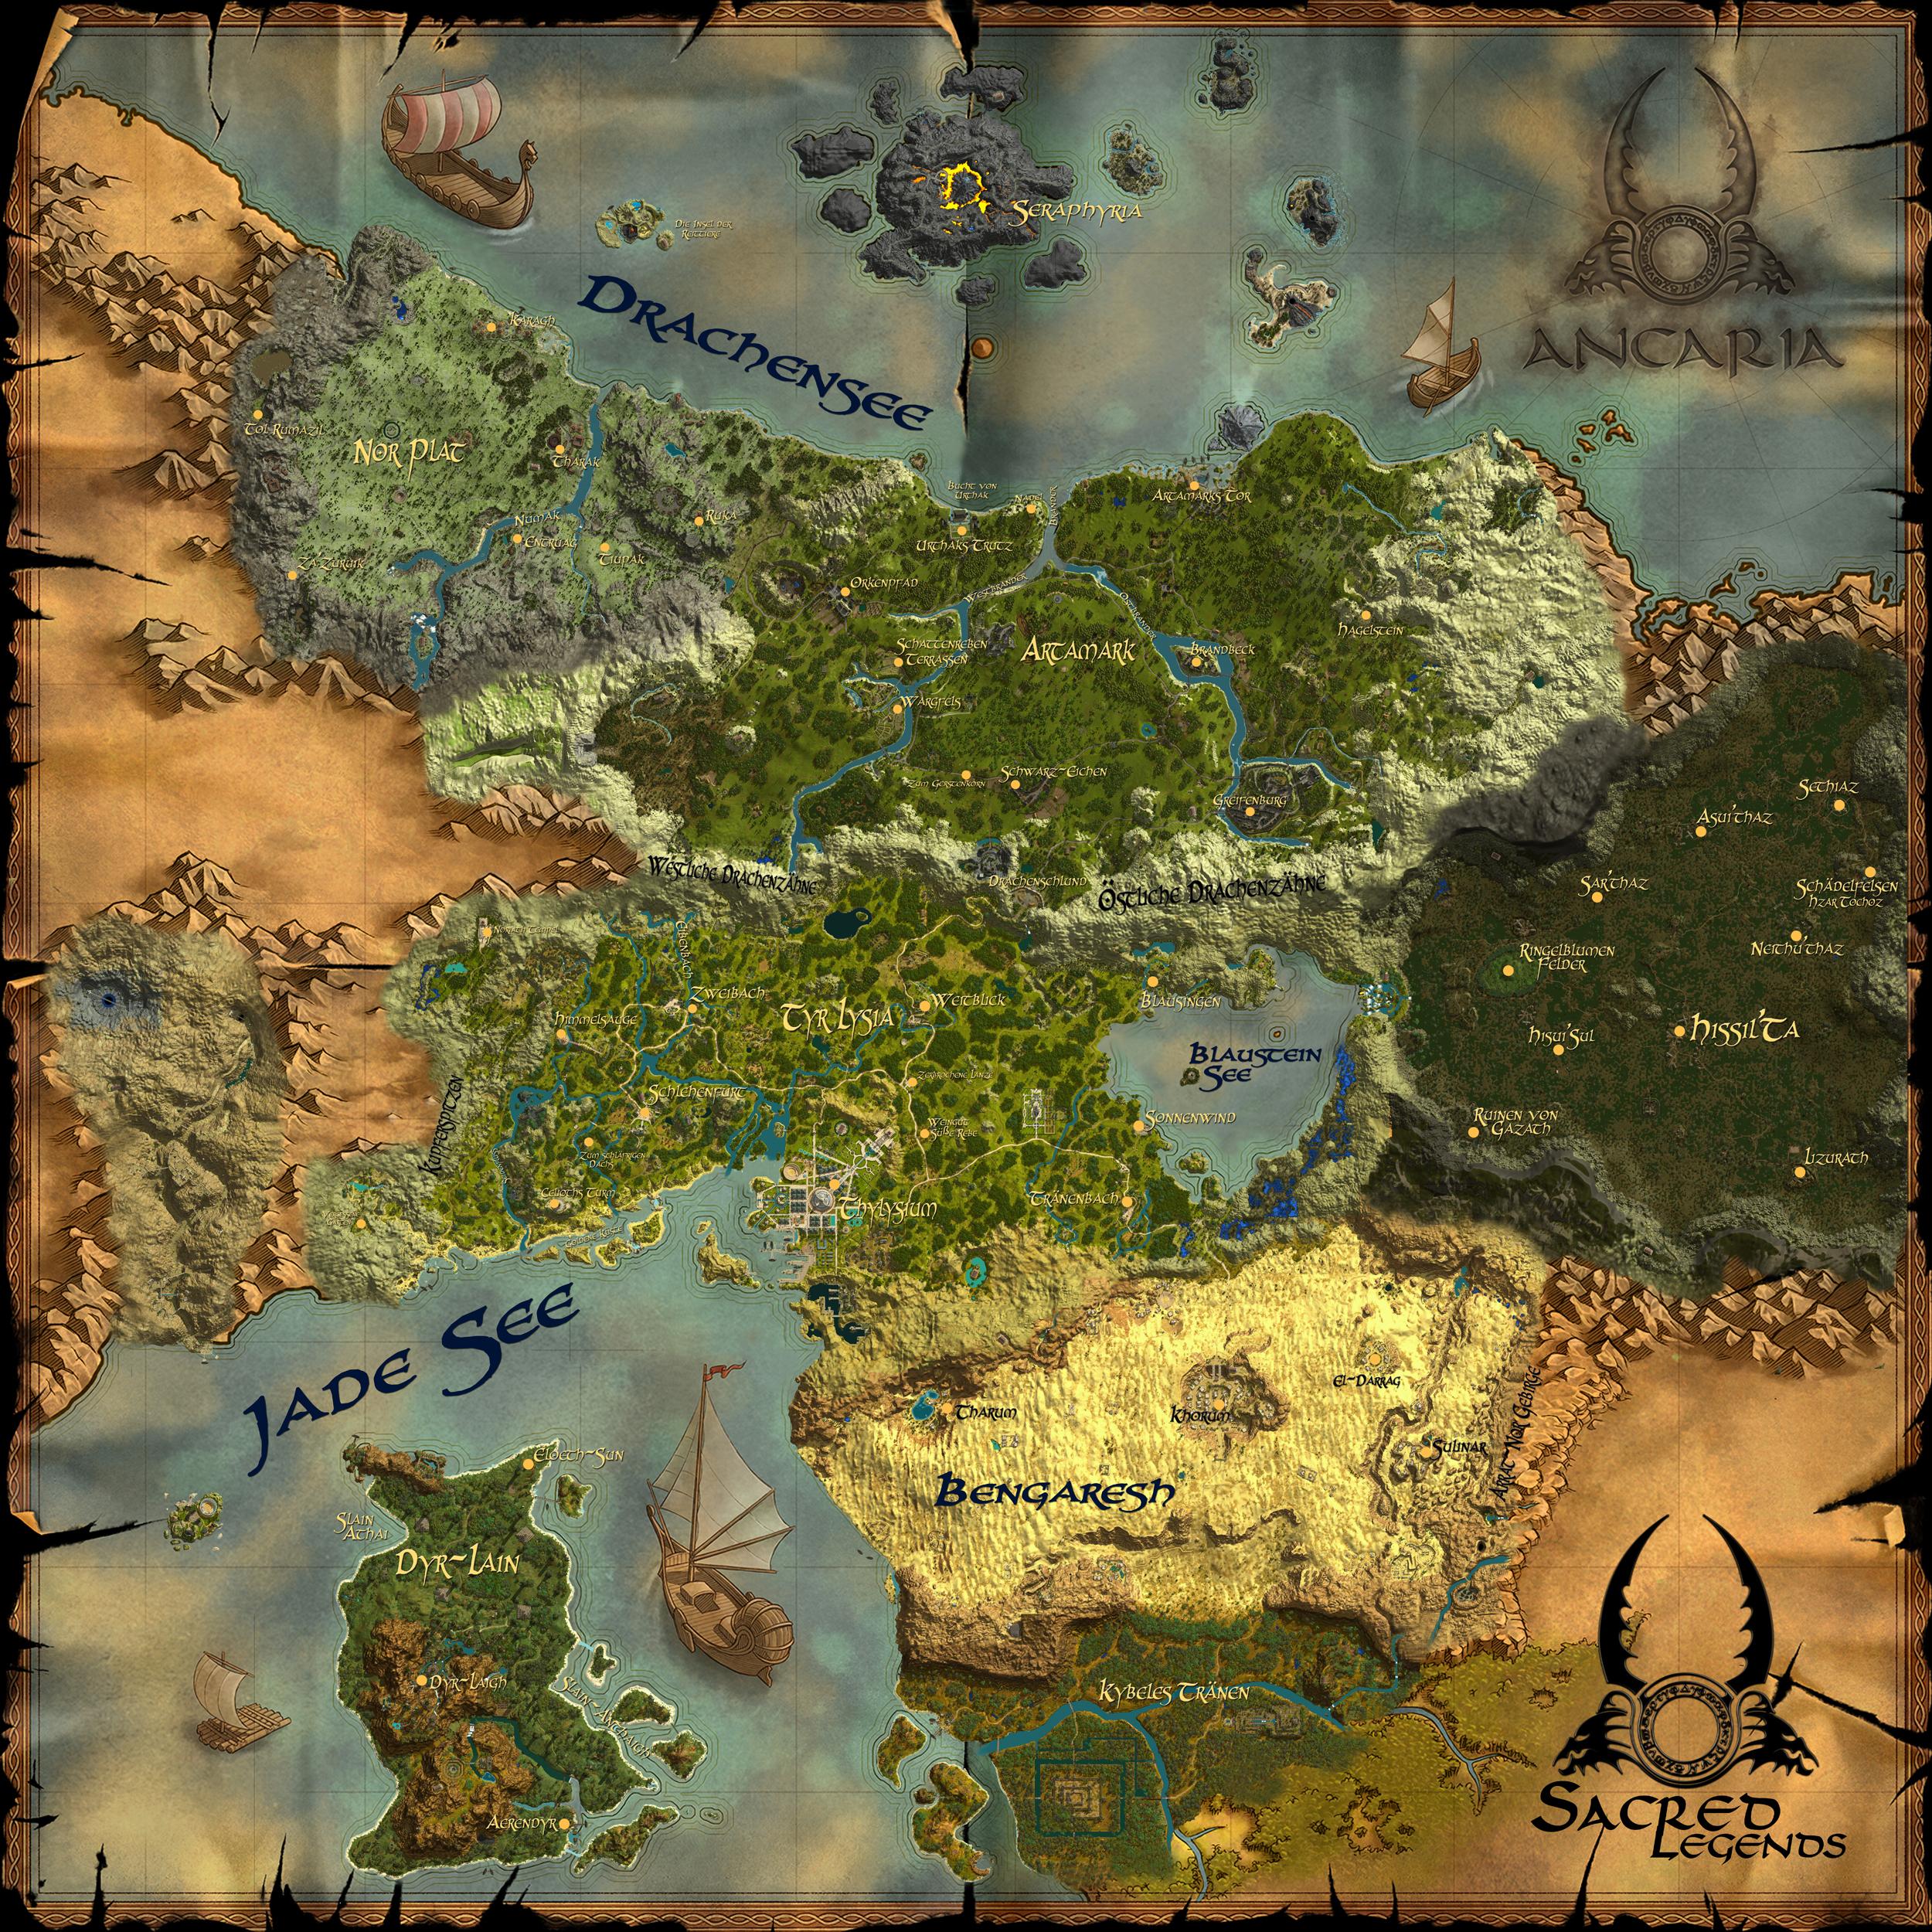 Rendermaparticlegross Sacred World Map on golden sun dark dawn world map, spore world map, assassin's creed world map, sacred angel, sacred 2 faq, street fighter 4 world map, sacred 2 mods, sacred 3 bosses, wolfenstein world map, sacred 2 characters, shogun total war world map, forza horizon 2 map, sacred 2 bosses, illusion of gaia world map, sacred 2 art, anime style world map, largest game world map, sacred pc, red alert 3 world map,